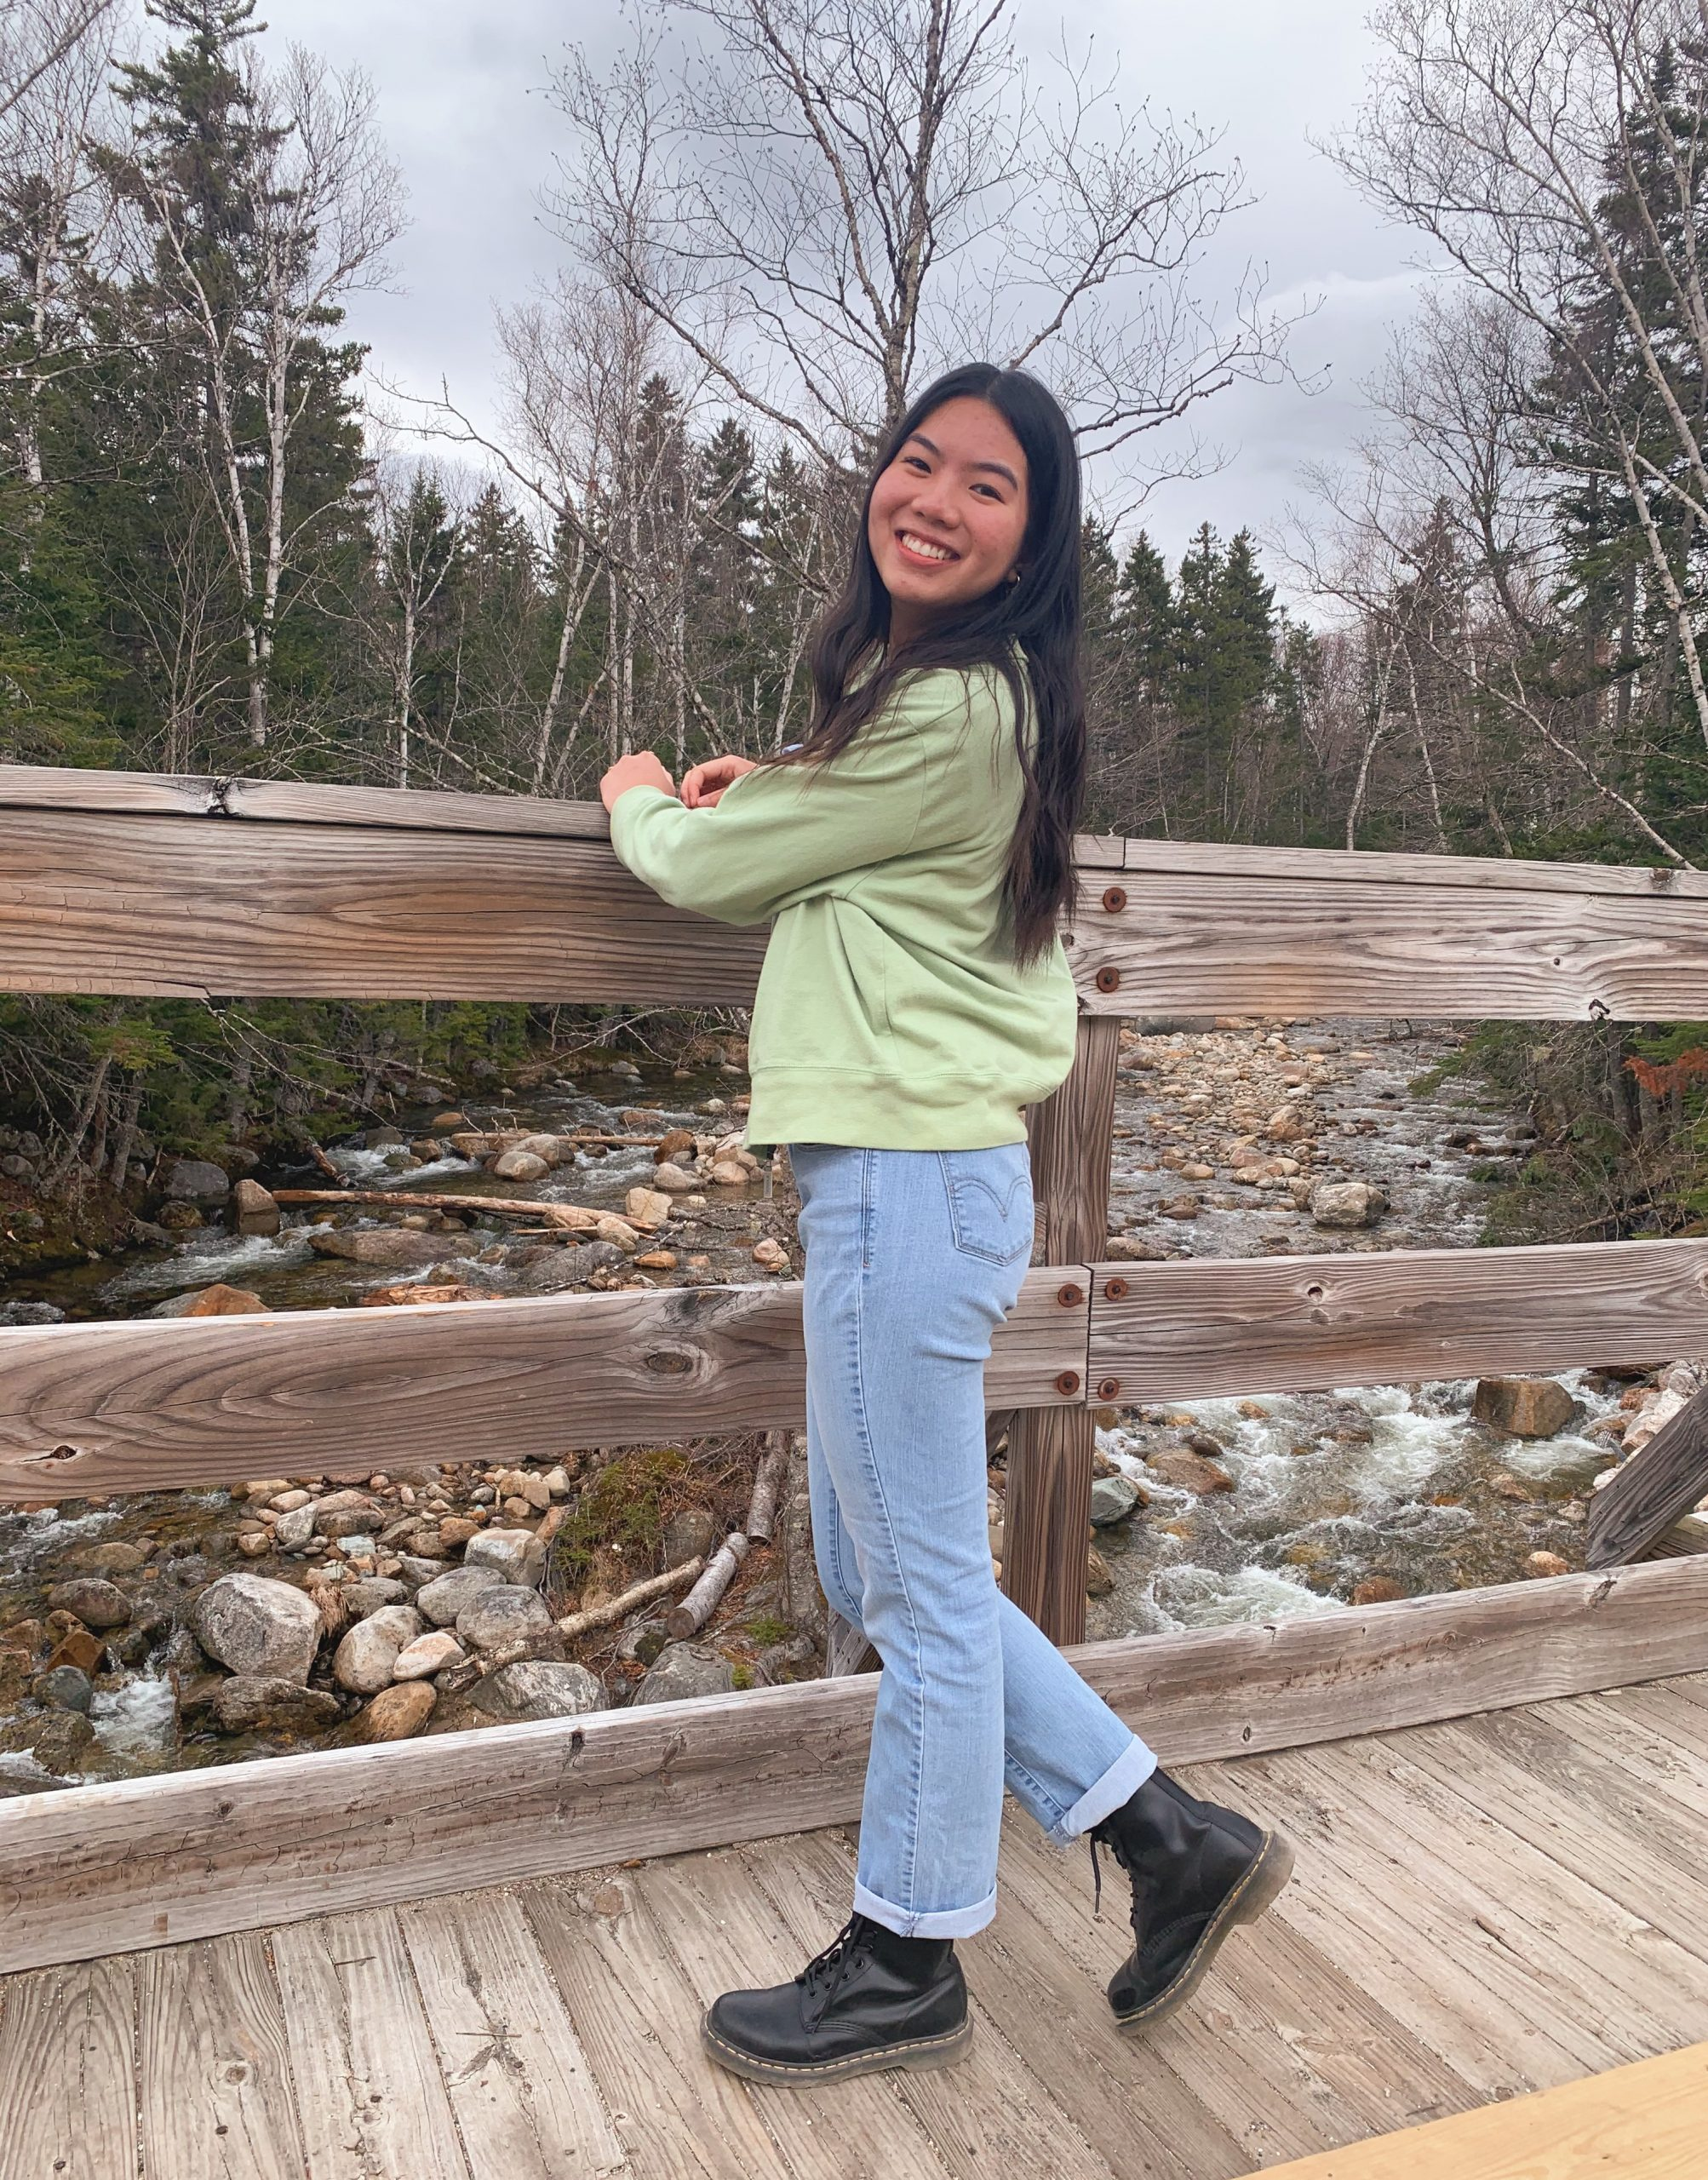 Jocelyn Phung